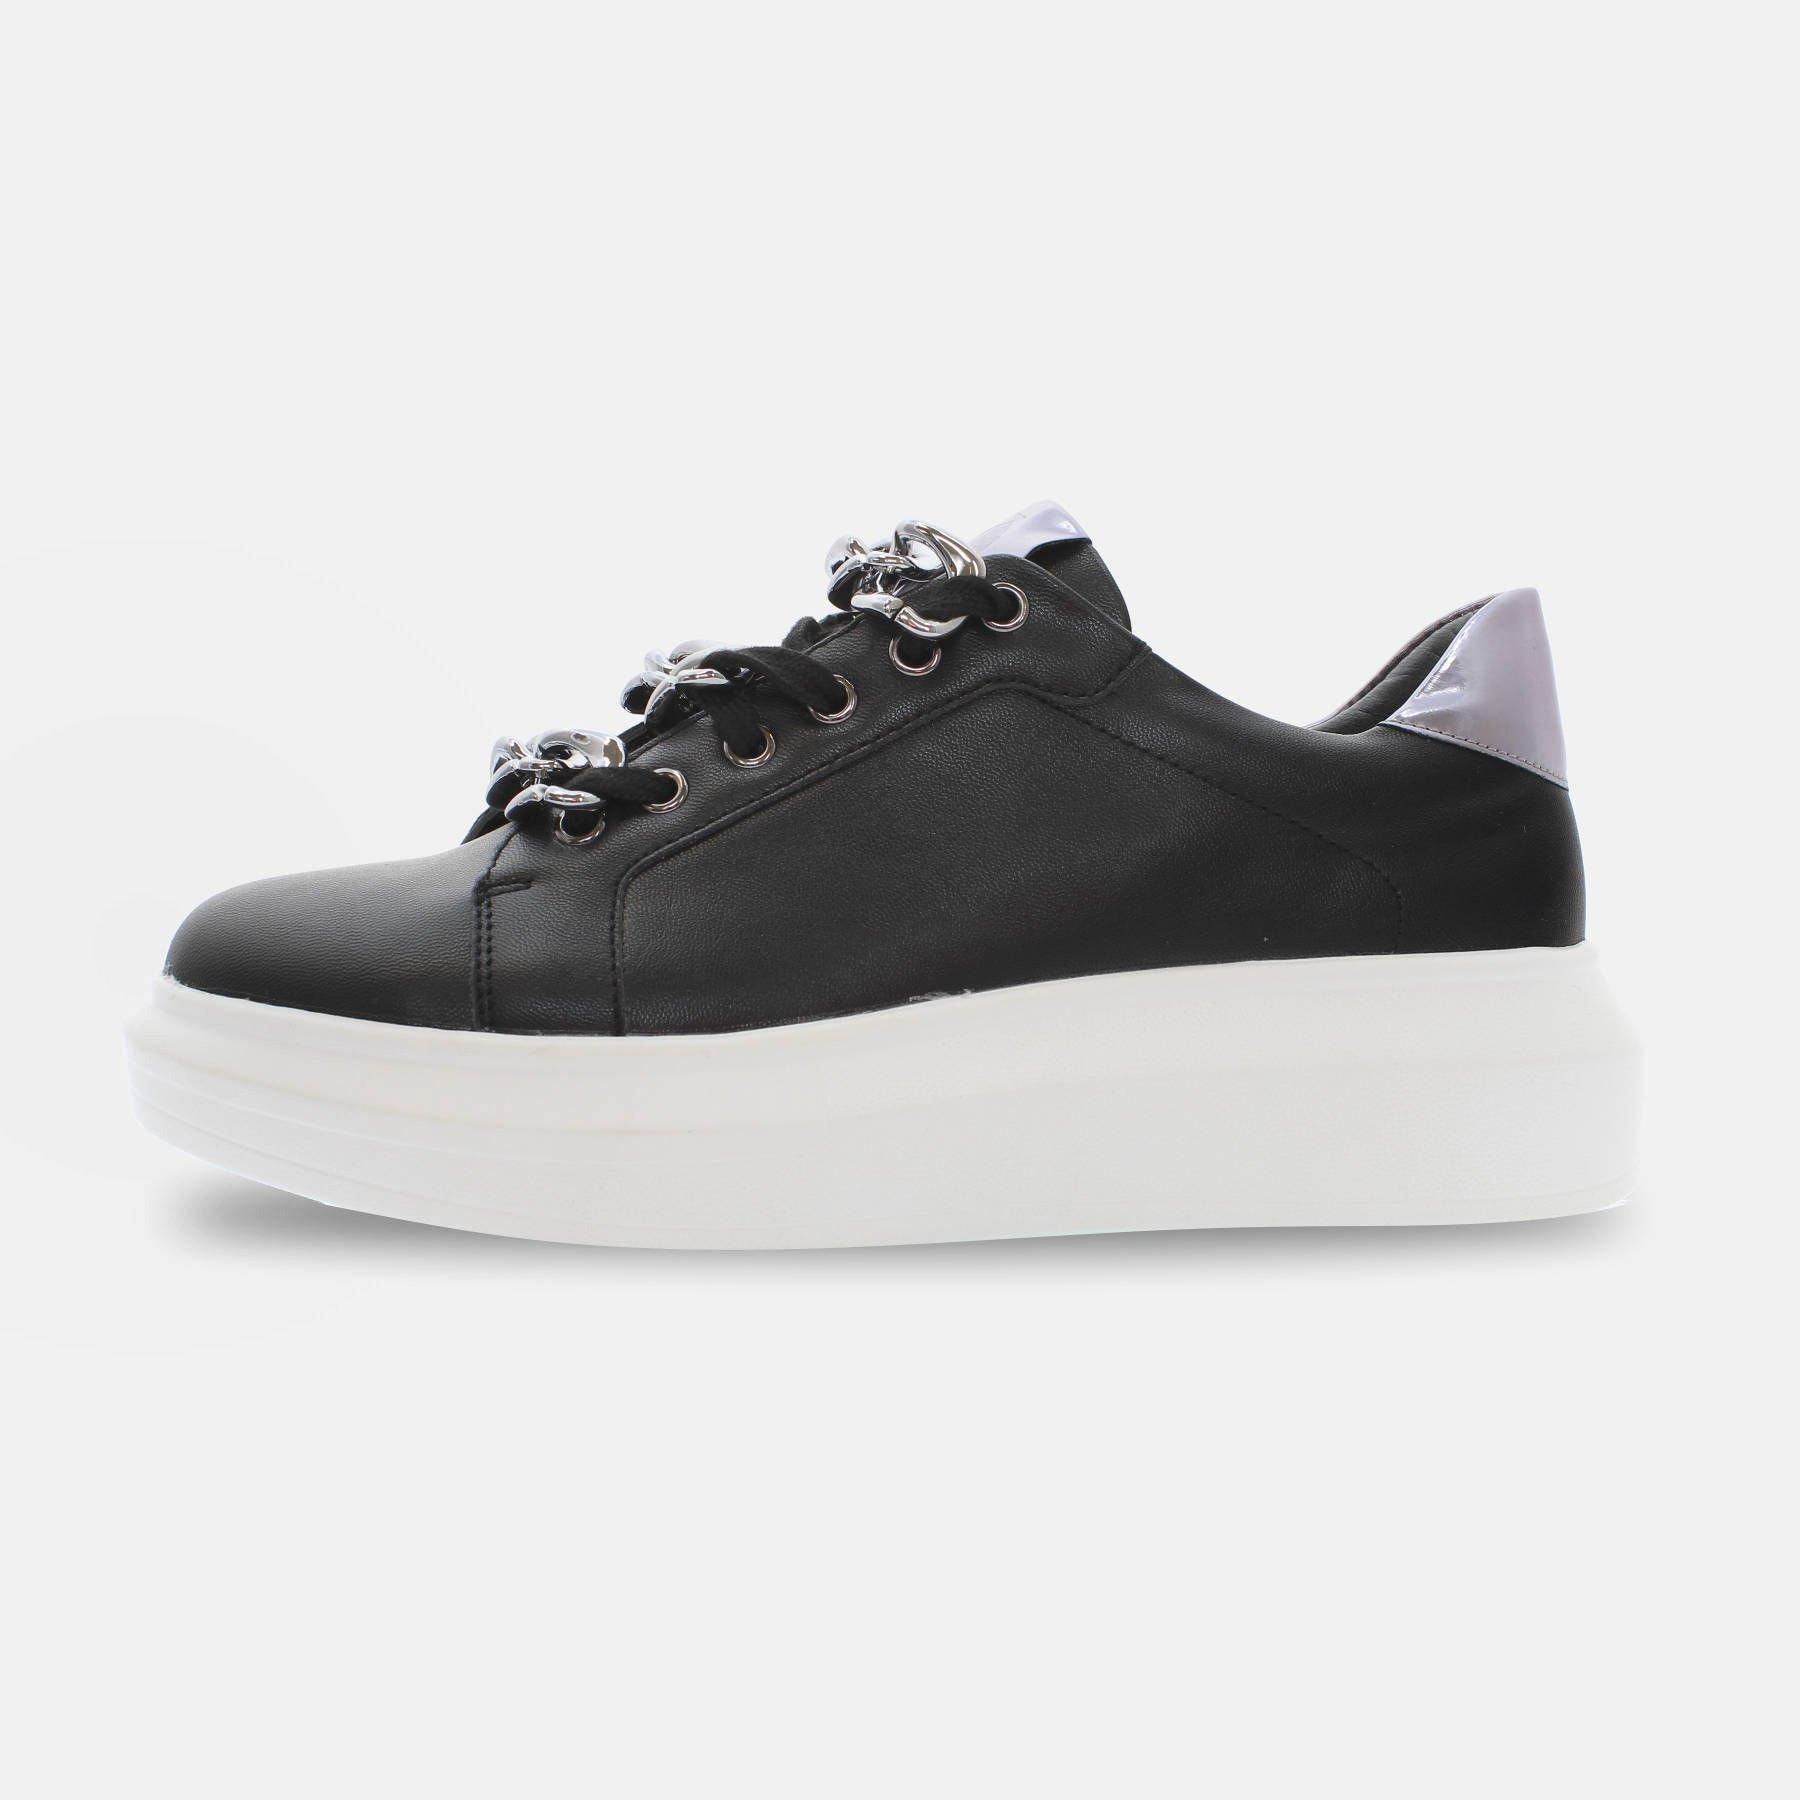 Kharisma Sneakers catena nero 2041